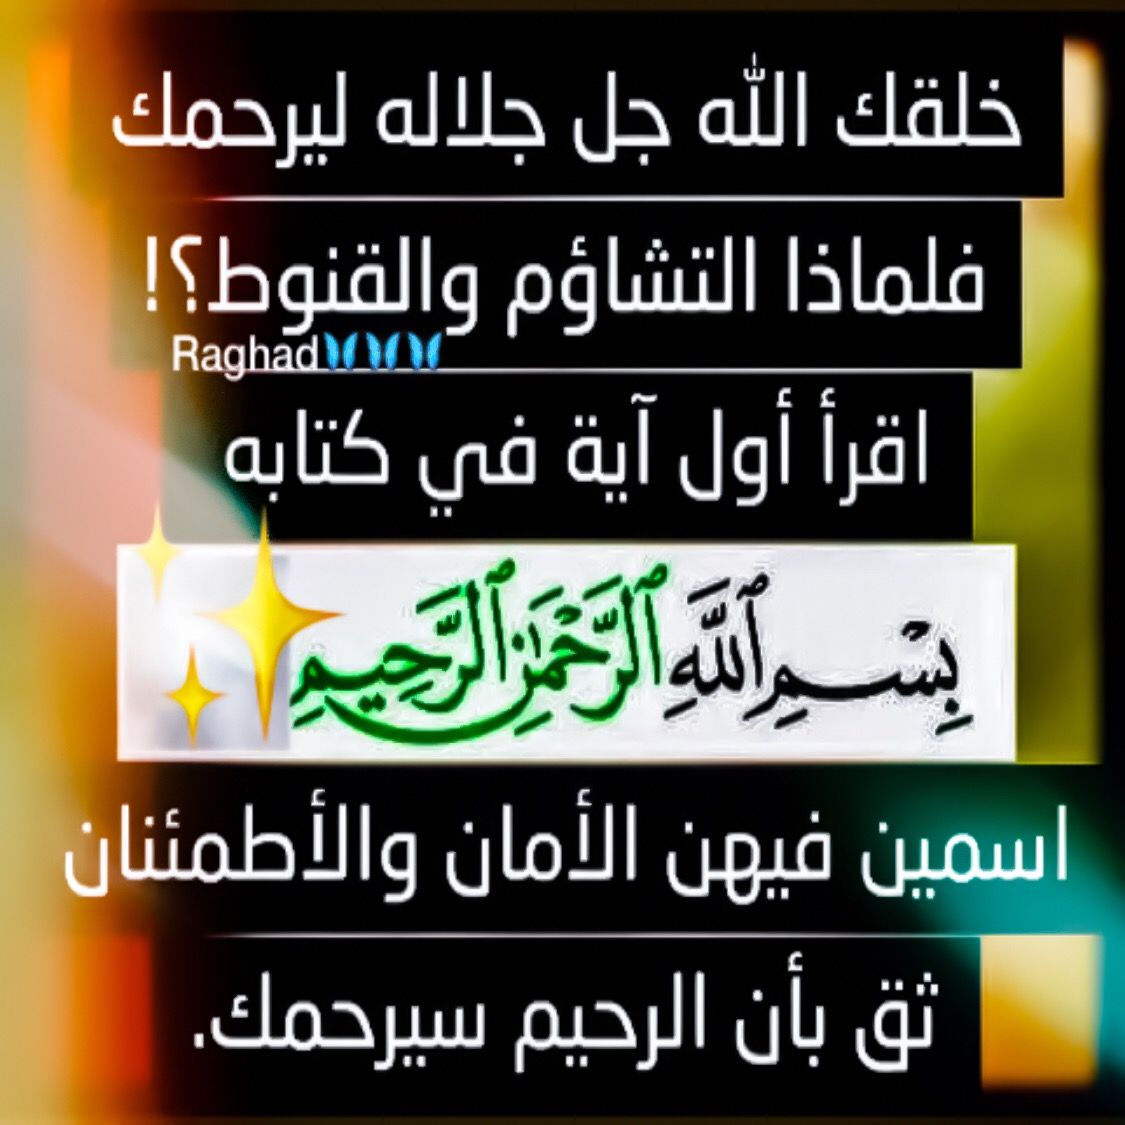 Desertrose اسم الله الرحمن الرحيم Quran Deserts Arabic Calligraphy